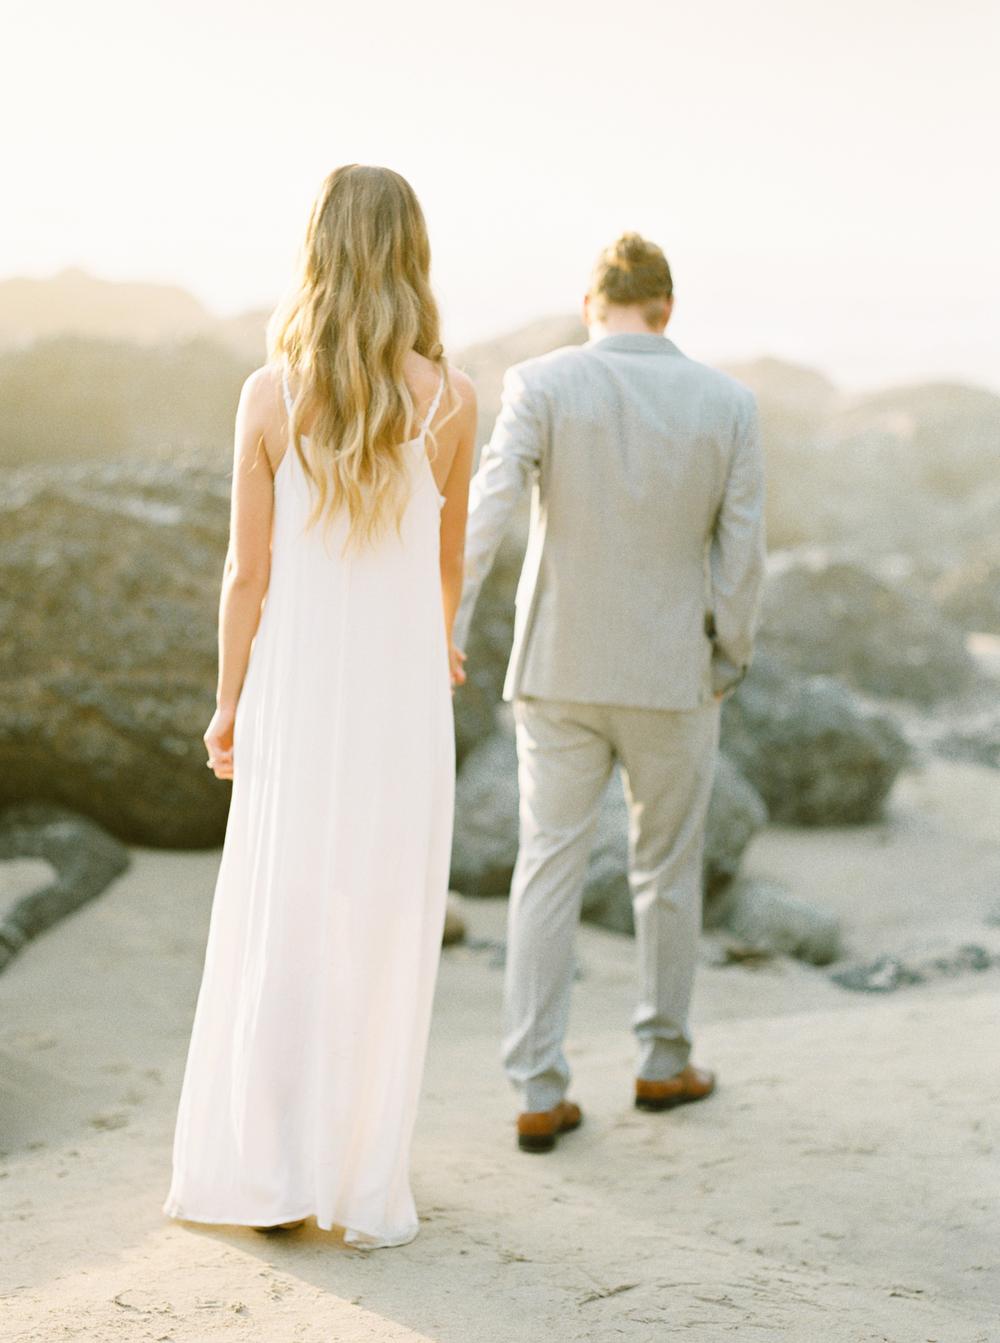 Katie-nicolle-niagara-wedding-photographer-film-fine-art-toronto-32.jpg